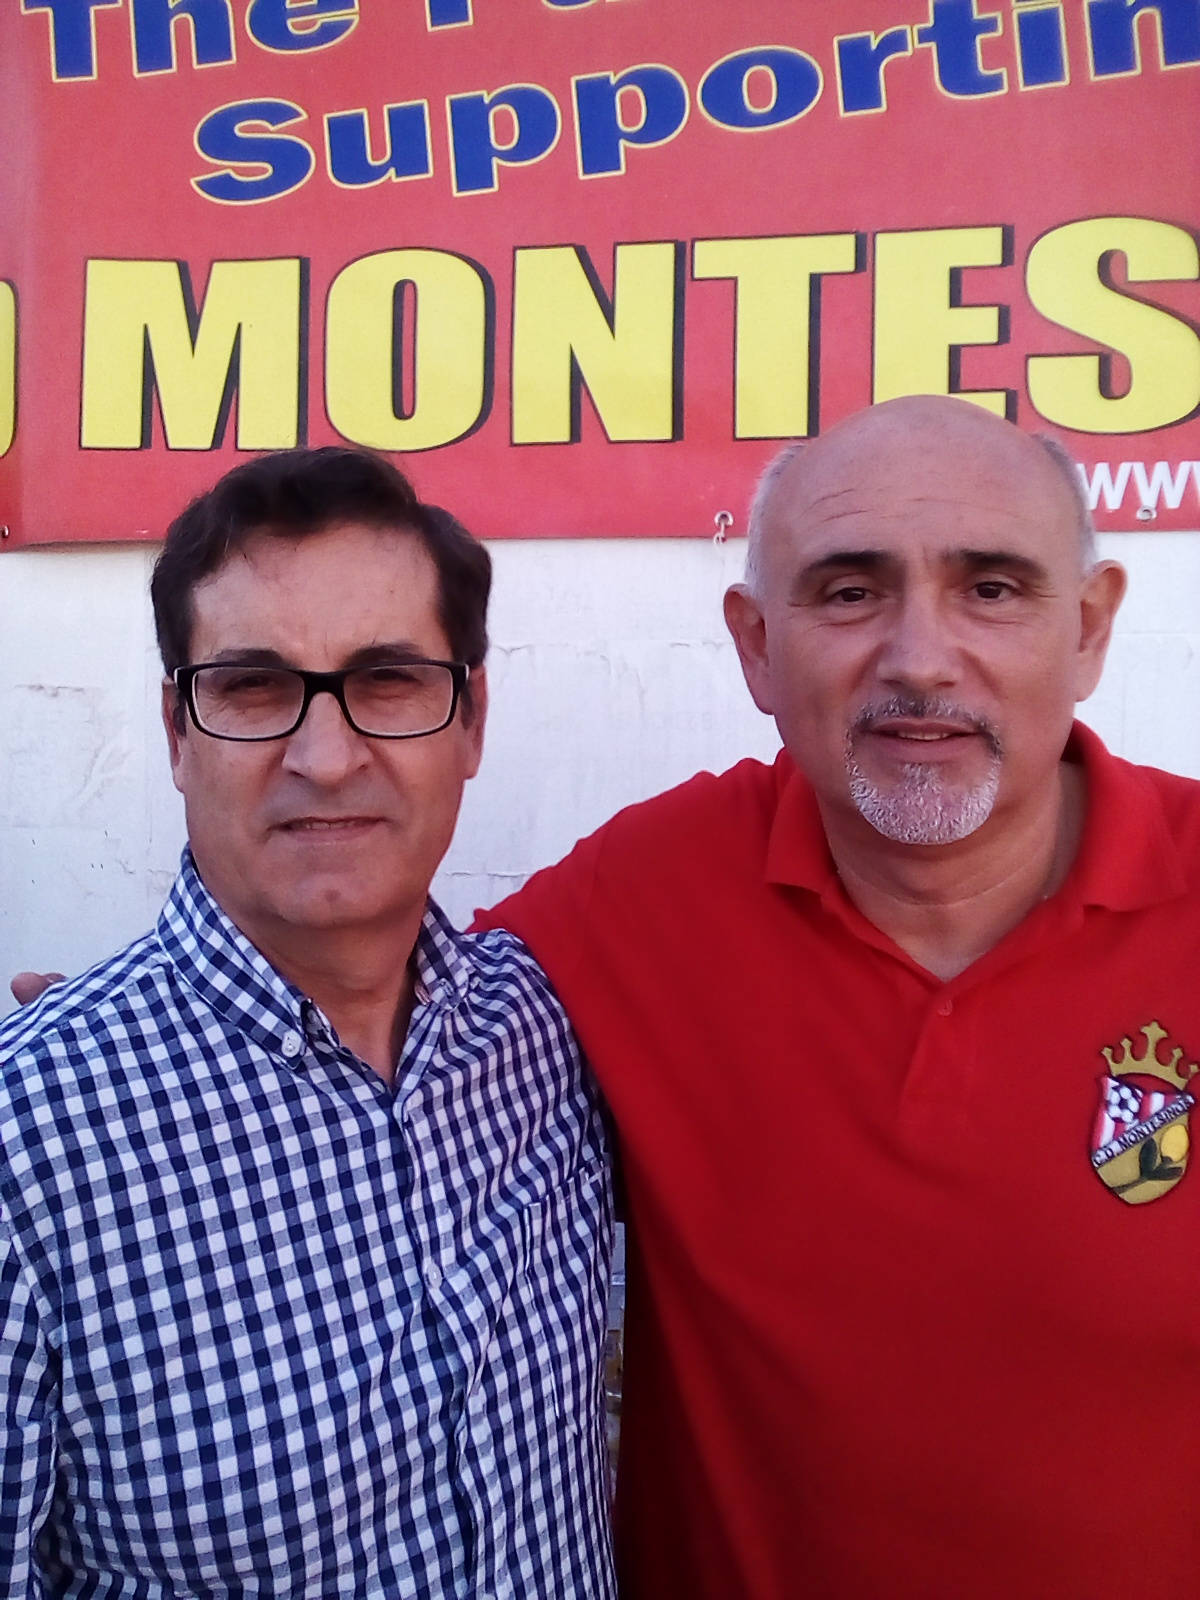 Mayor José praises club and fans at 'Monte'